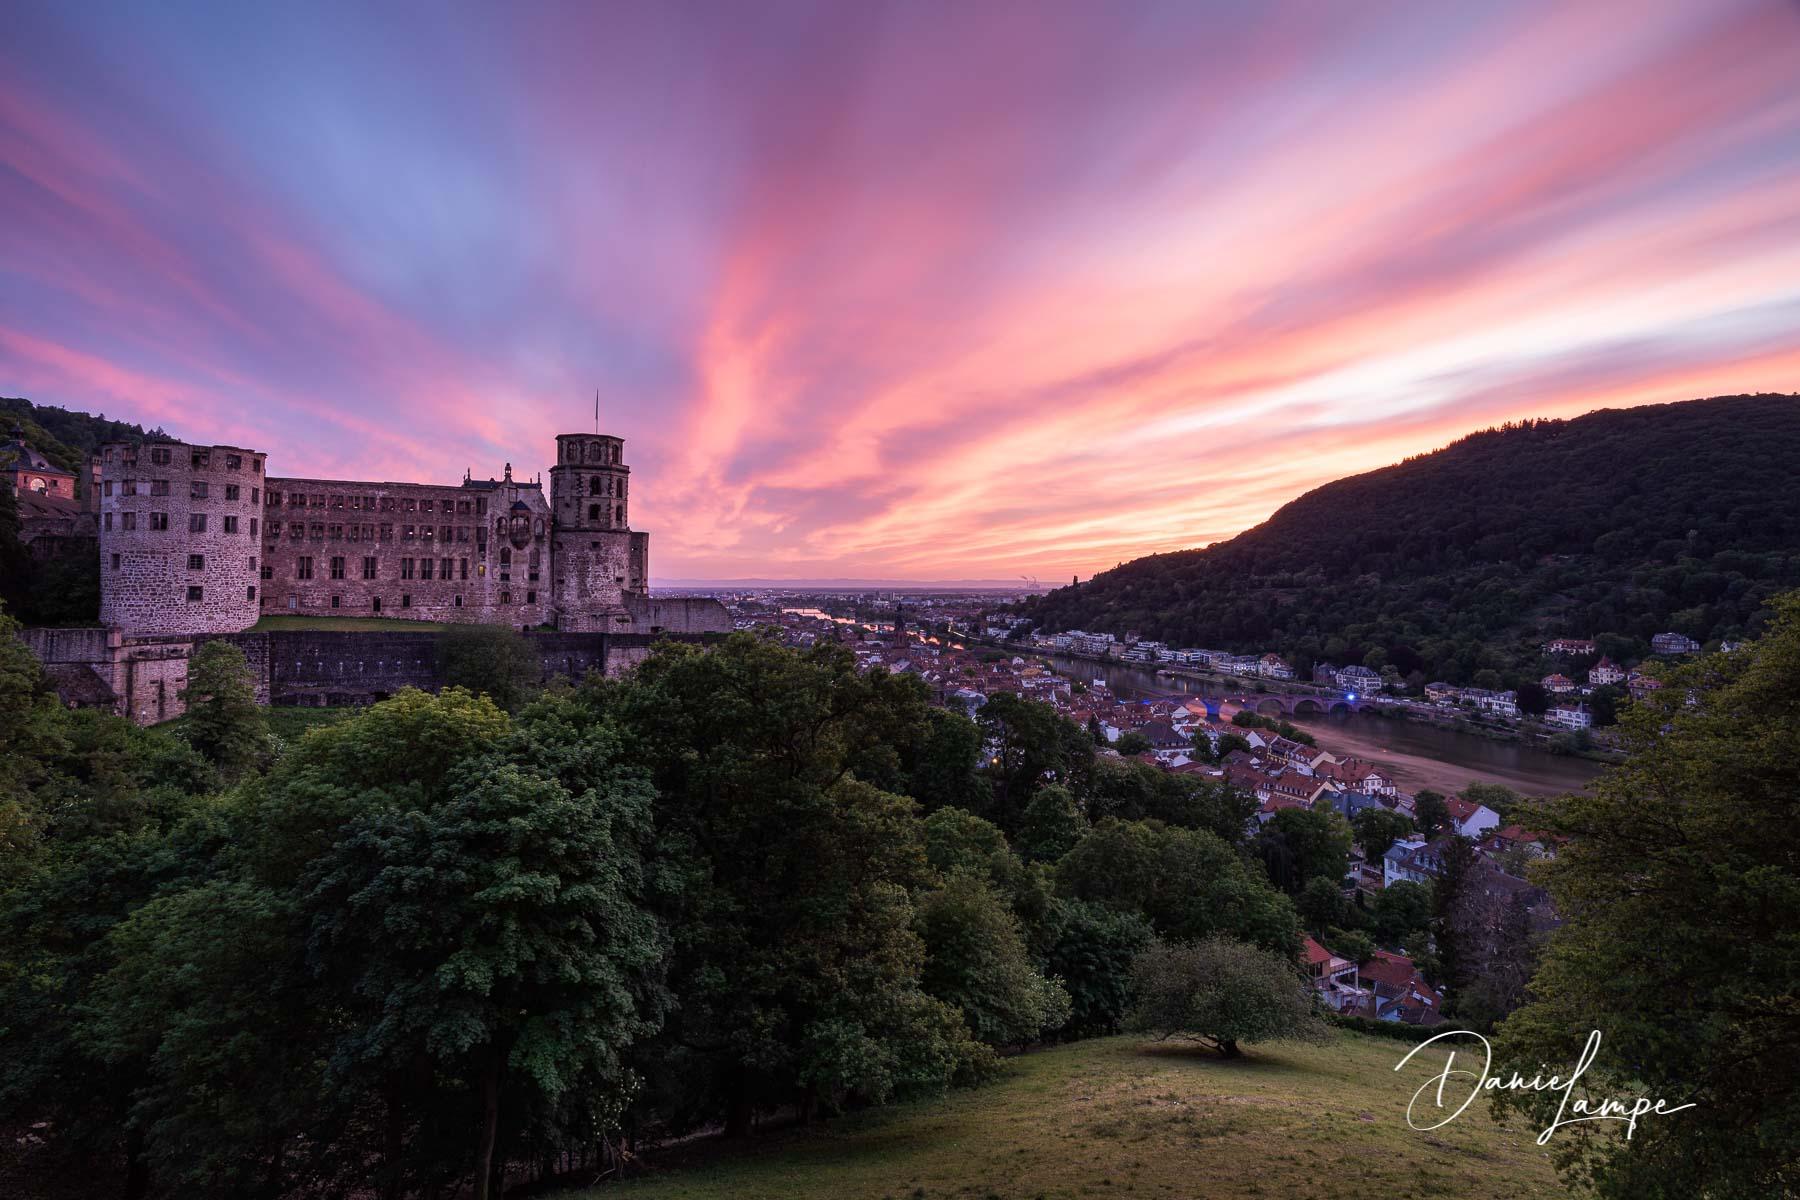 Deutschland, Heidelberg, Schloss, Alte Brücke, Karl-Theodor-Brücke, Altstadt, Abendrot, Sonnenuntergang